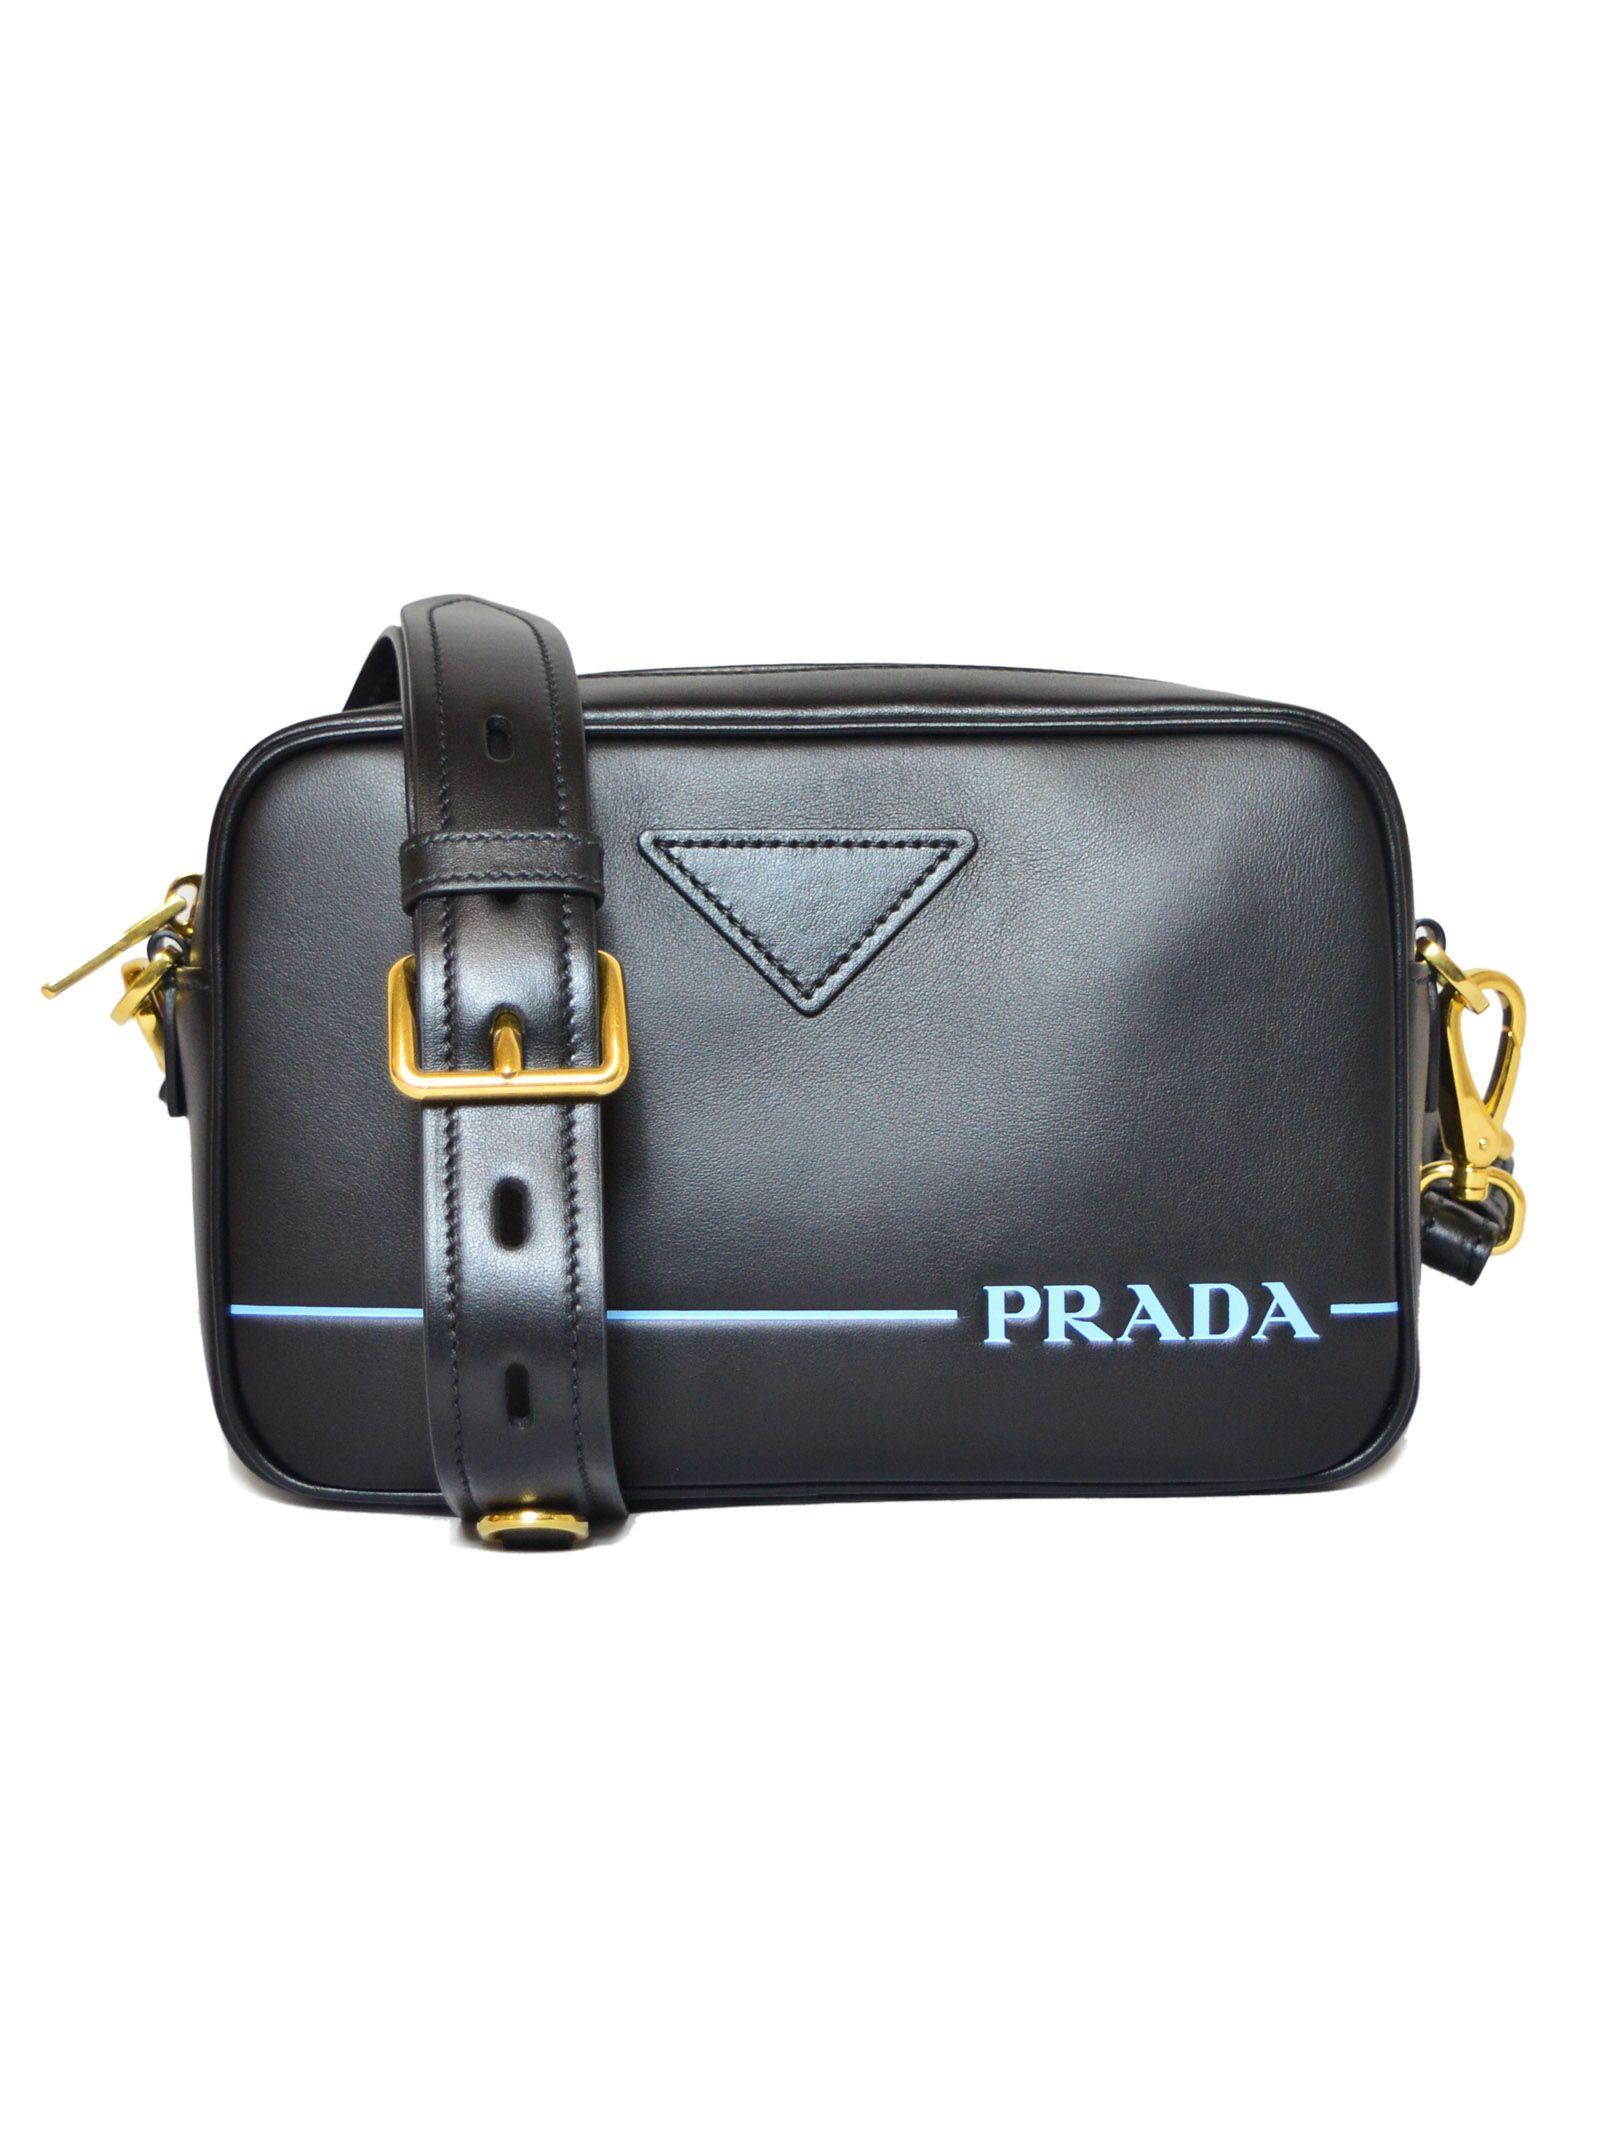 ebbb9a0f1a7596 Prada Mirage Leather Shoulder Bag Price | Stanford Center for ...